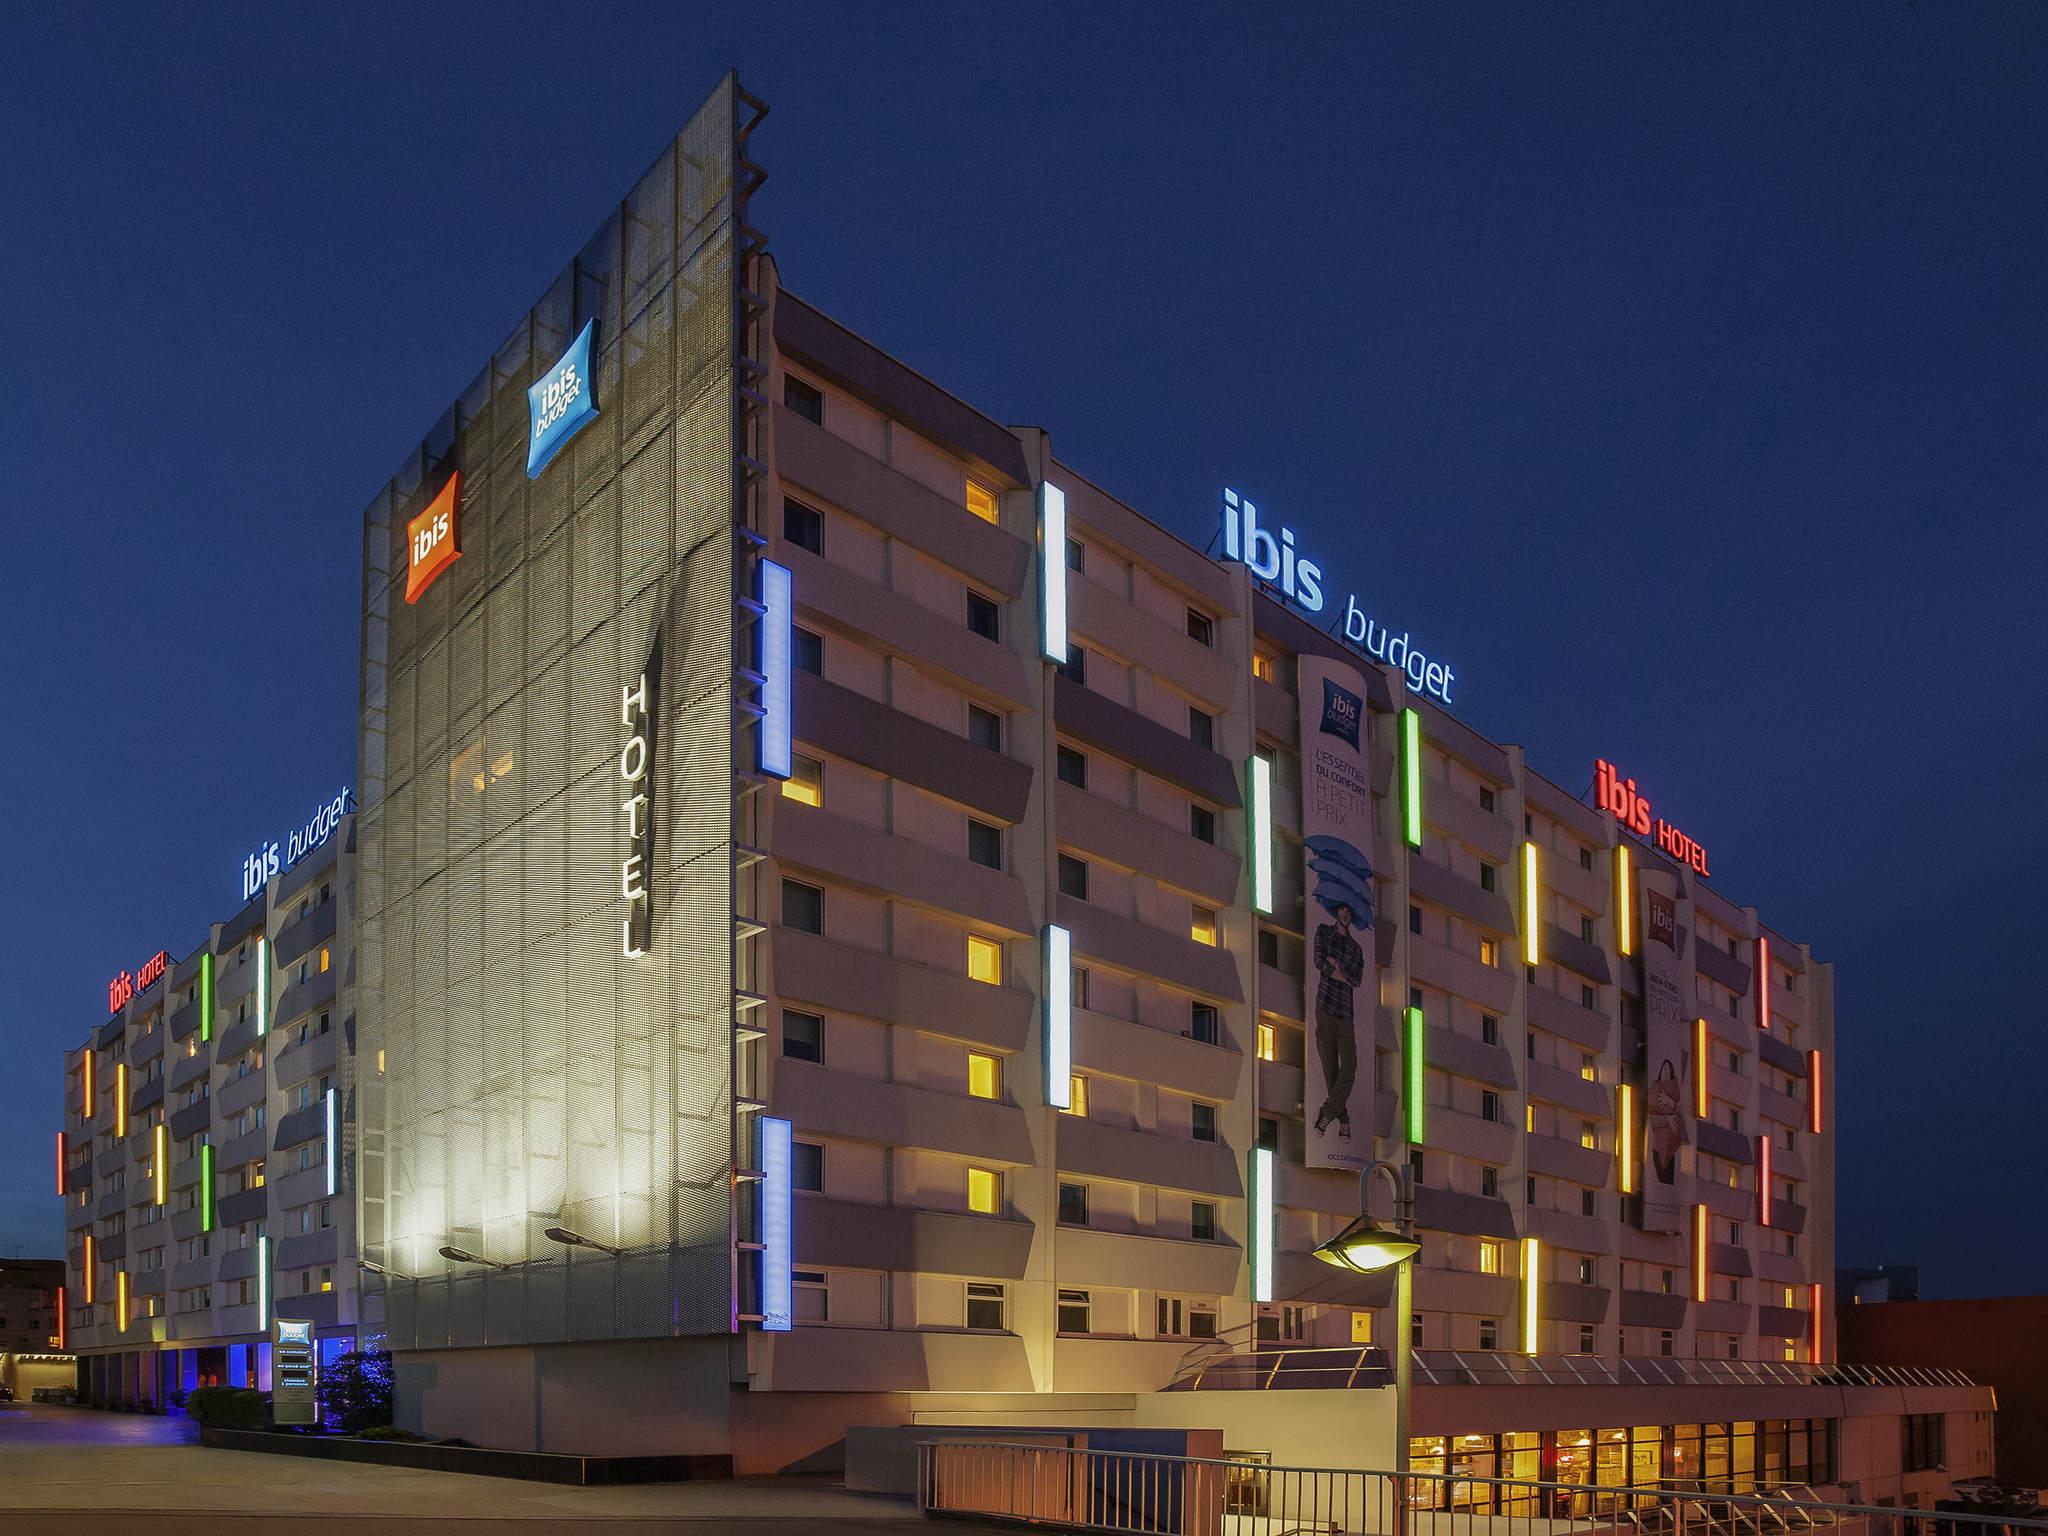 Hotel in bagnolet ibis budget paris porte de bagnolet - Ibis budget paris porte de bagnolet ...